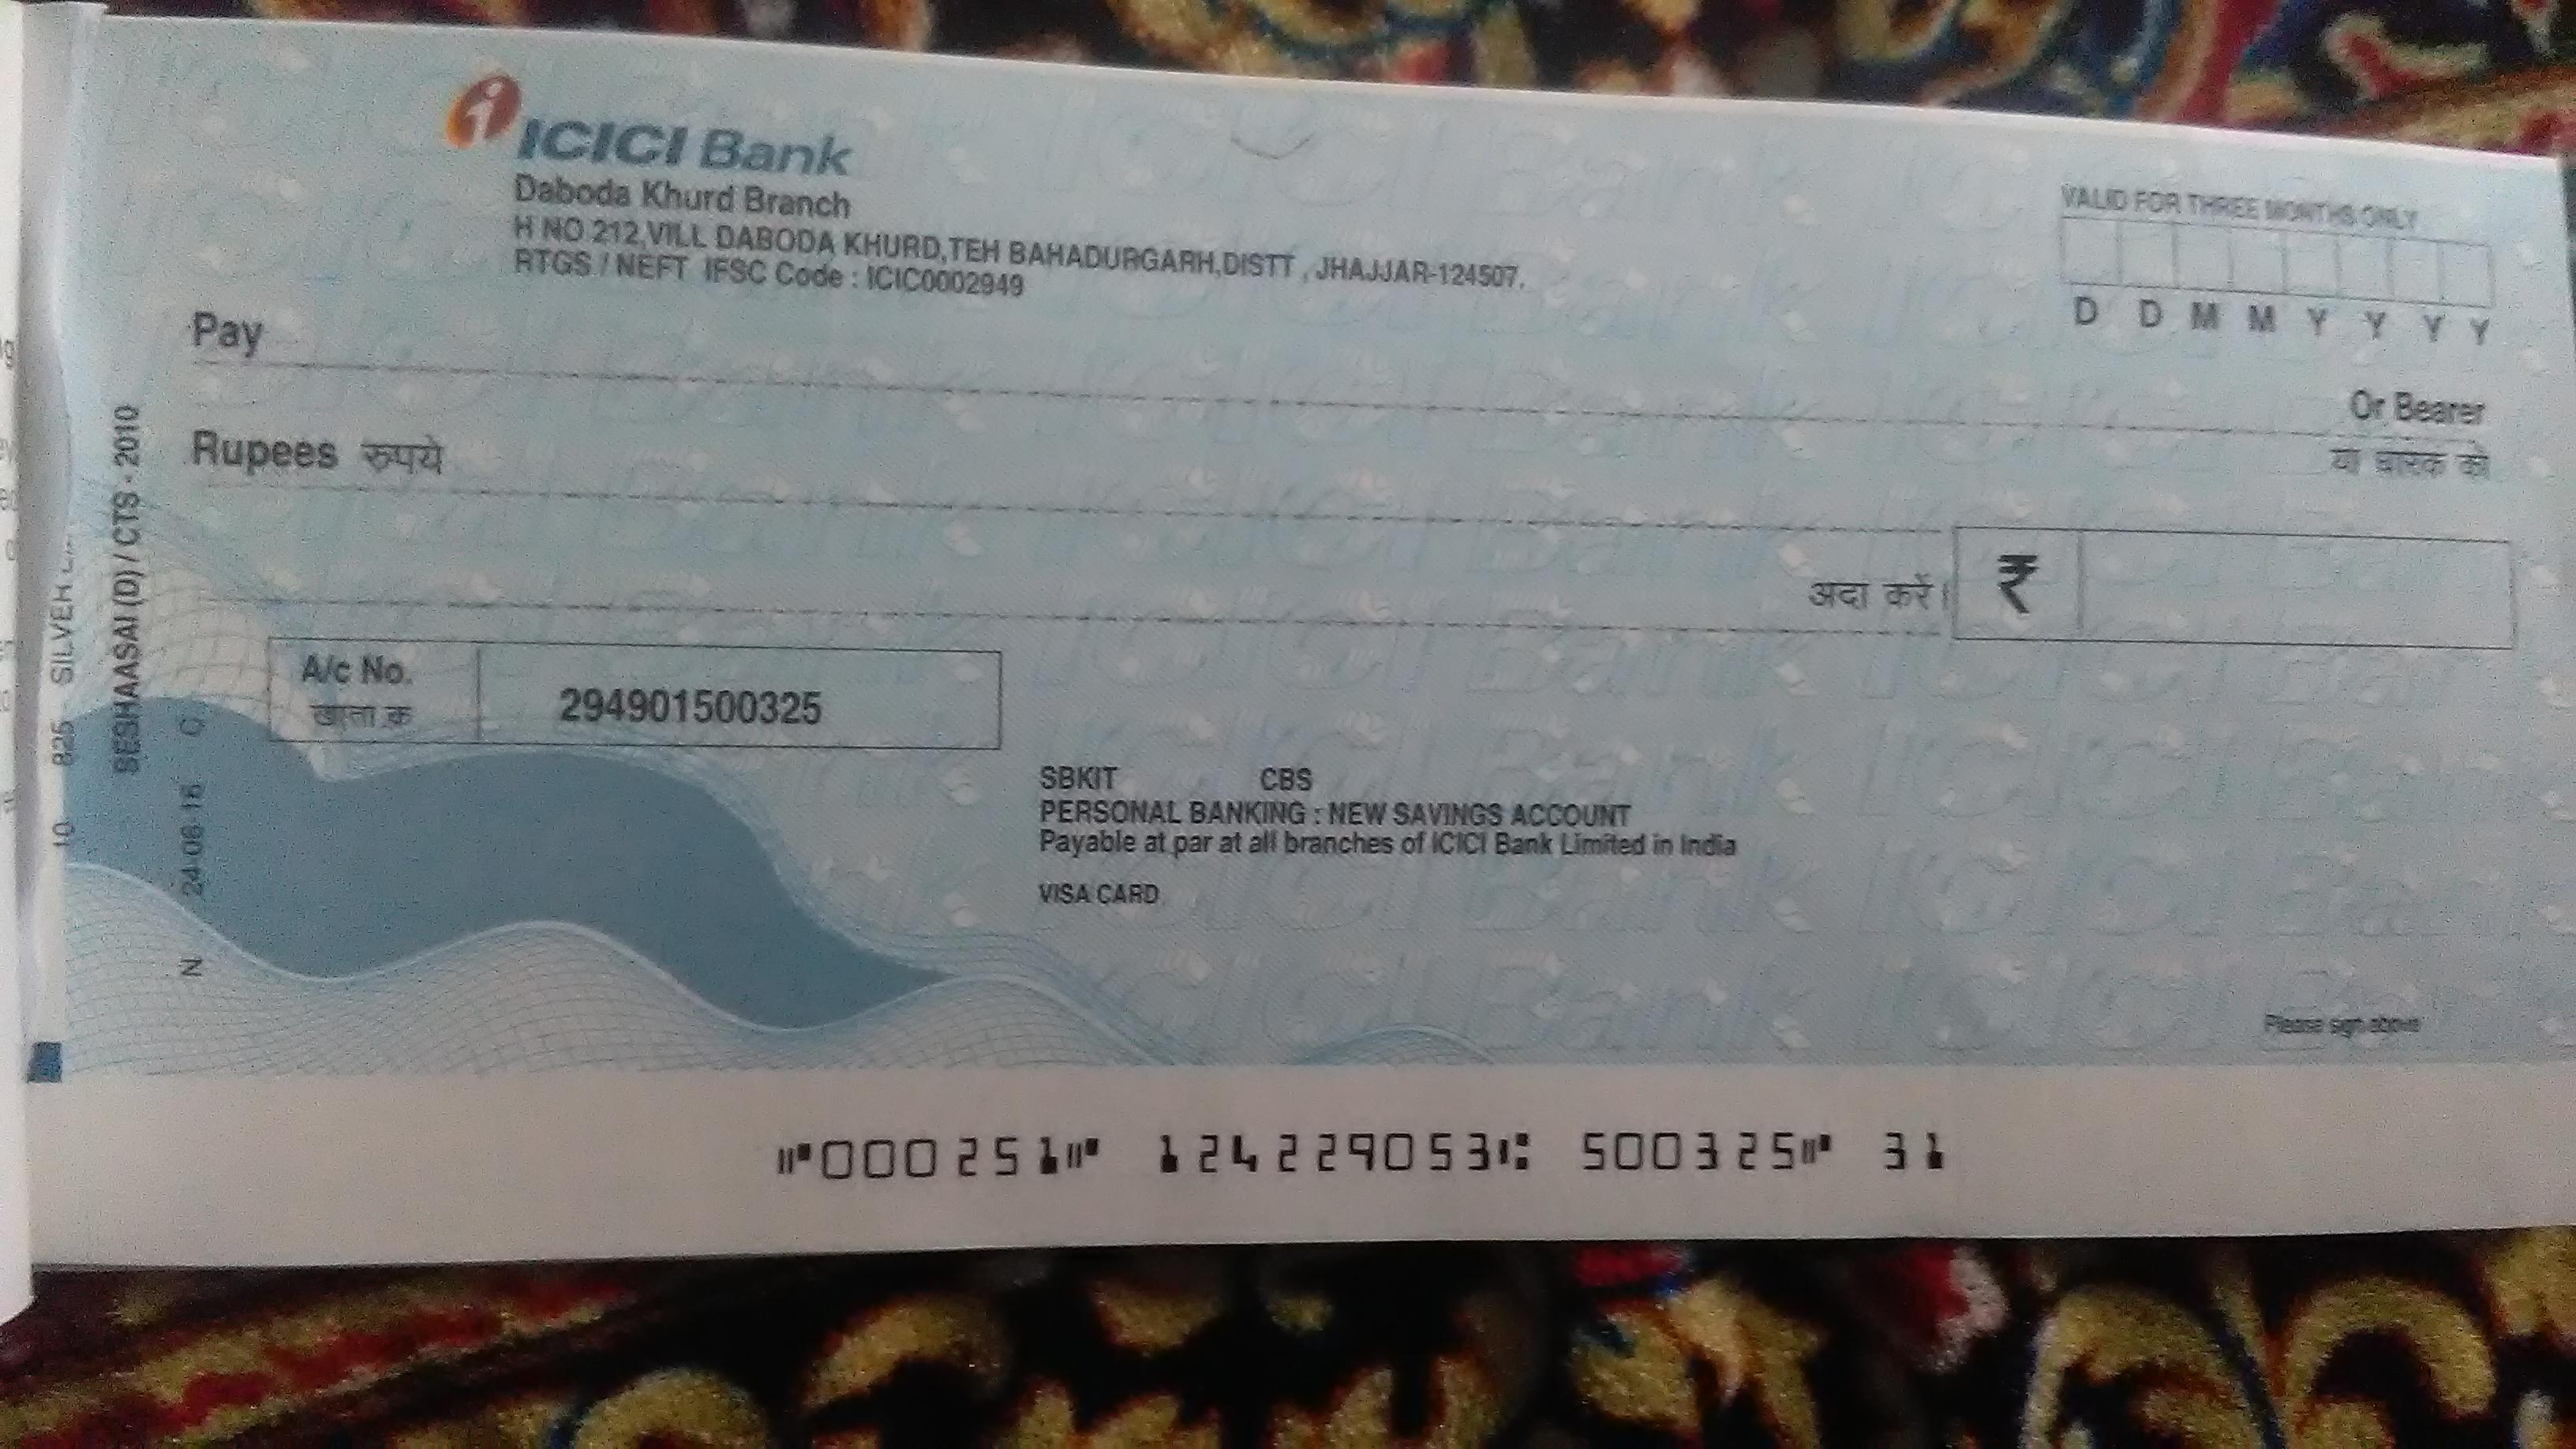 icici bank complaint number pune